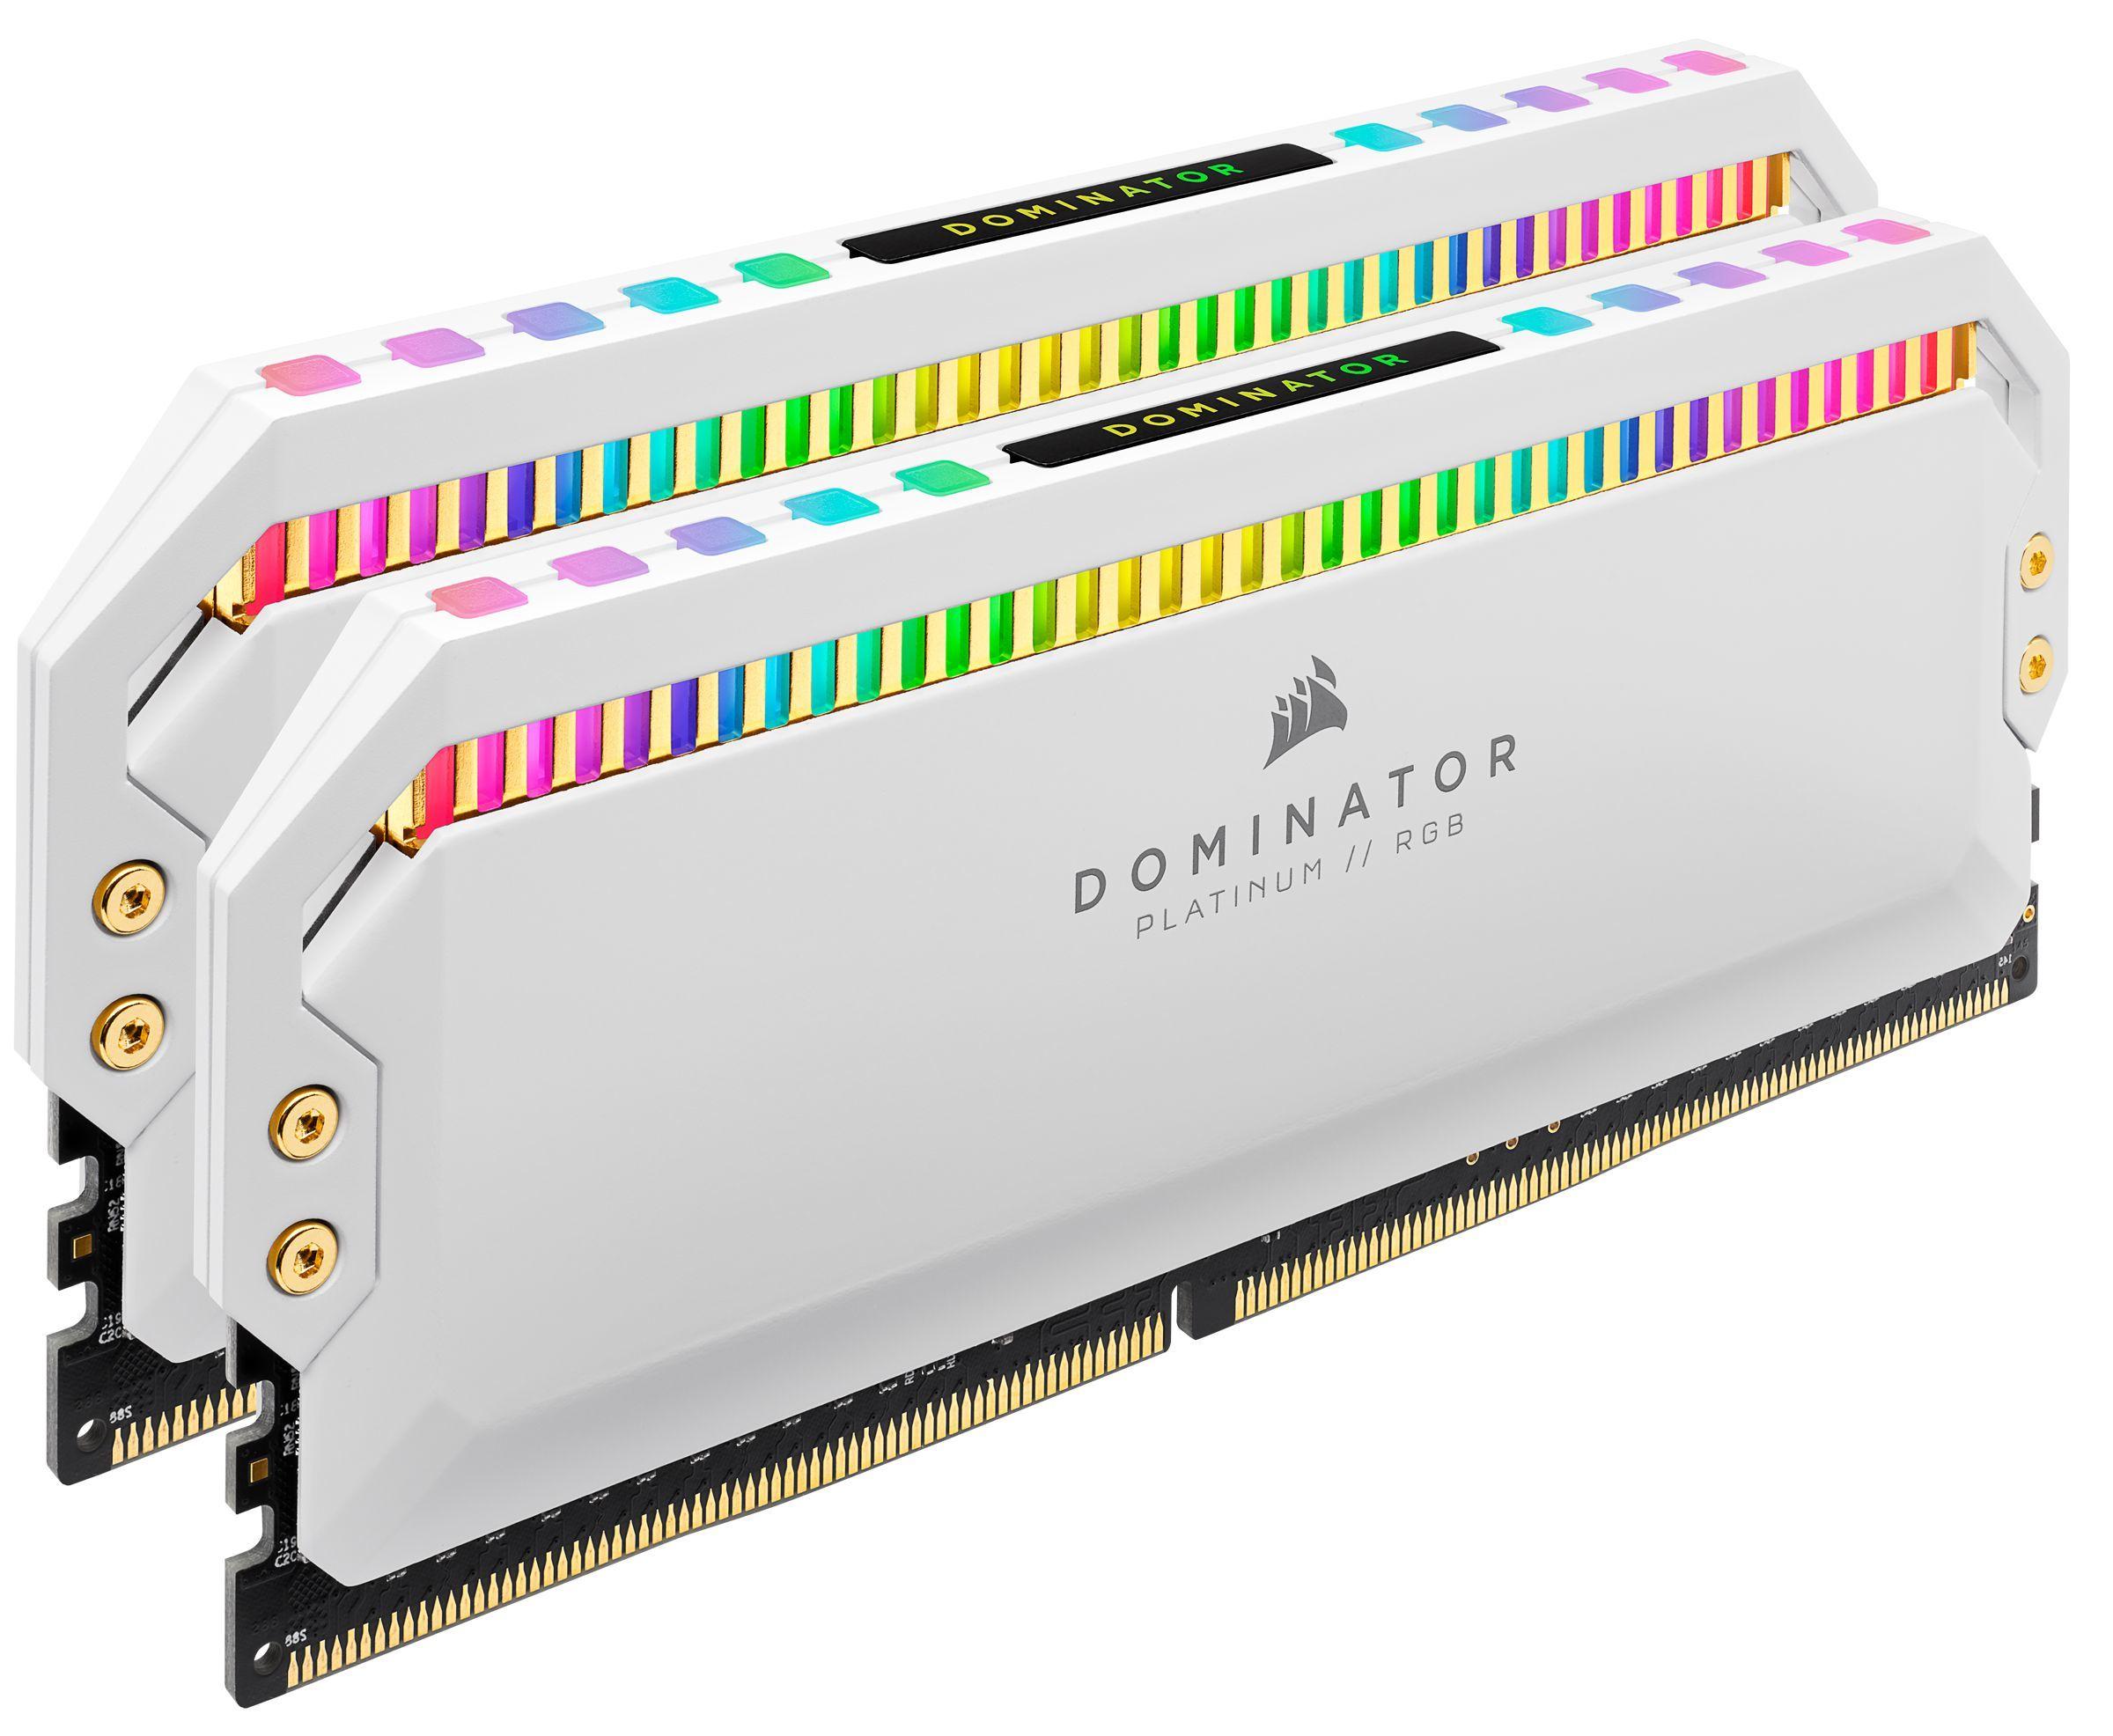 Dominator Platinum - 2 x 8 Go - DDR4 4000 MHz - RGB - Blanc